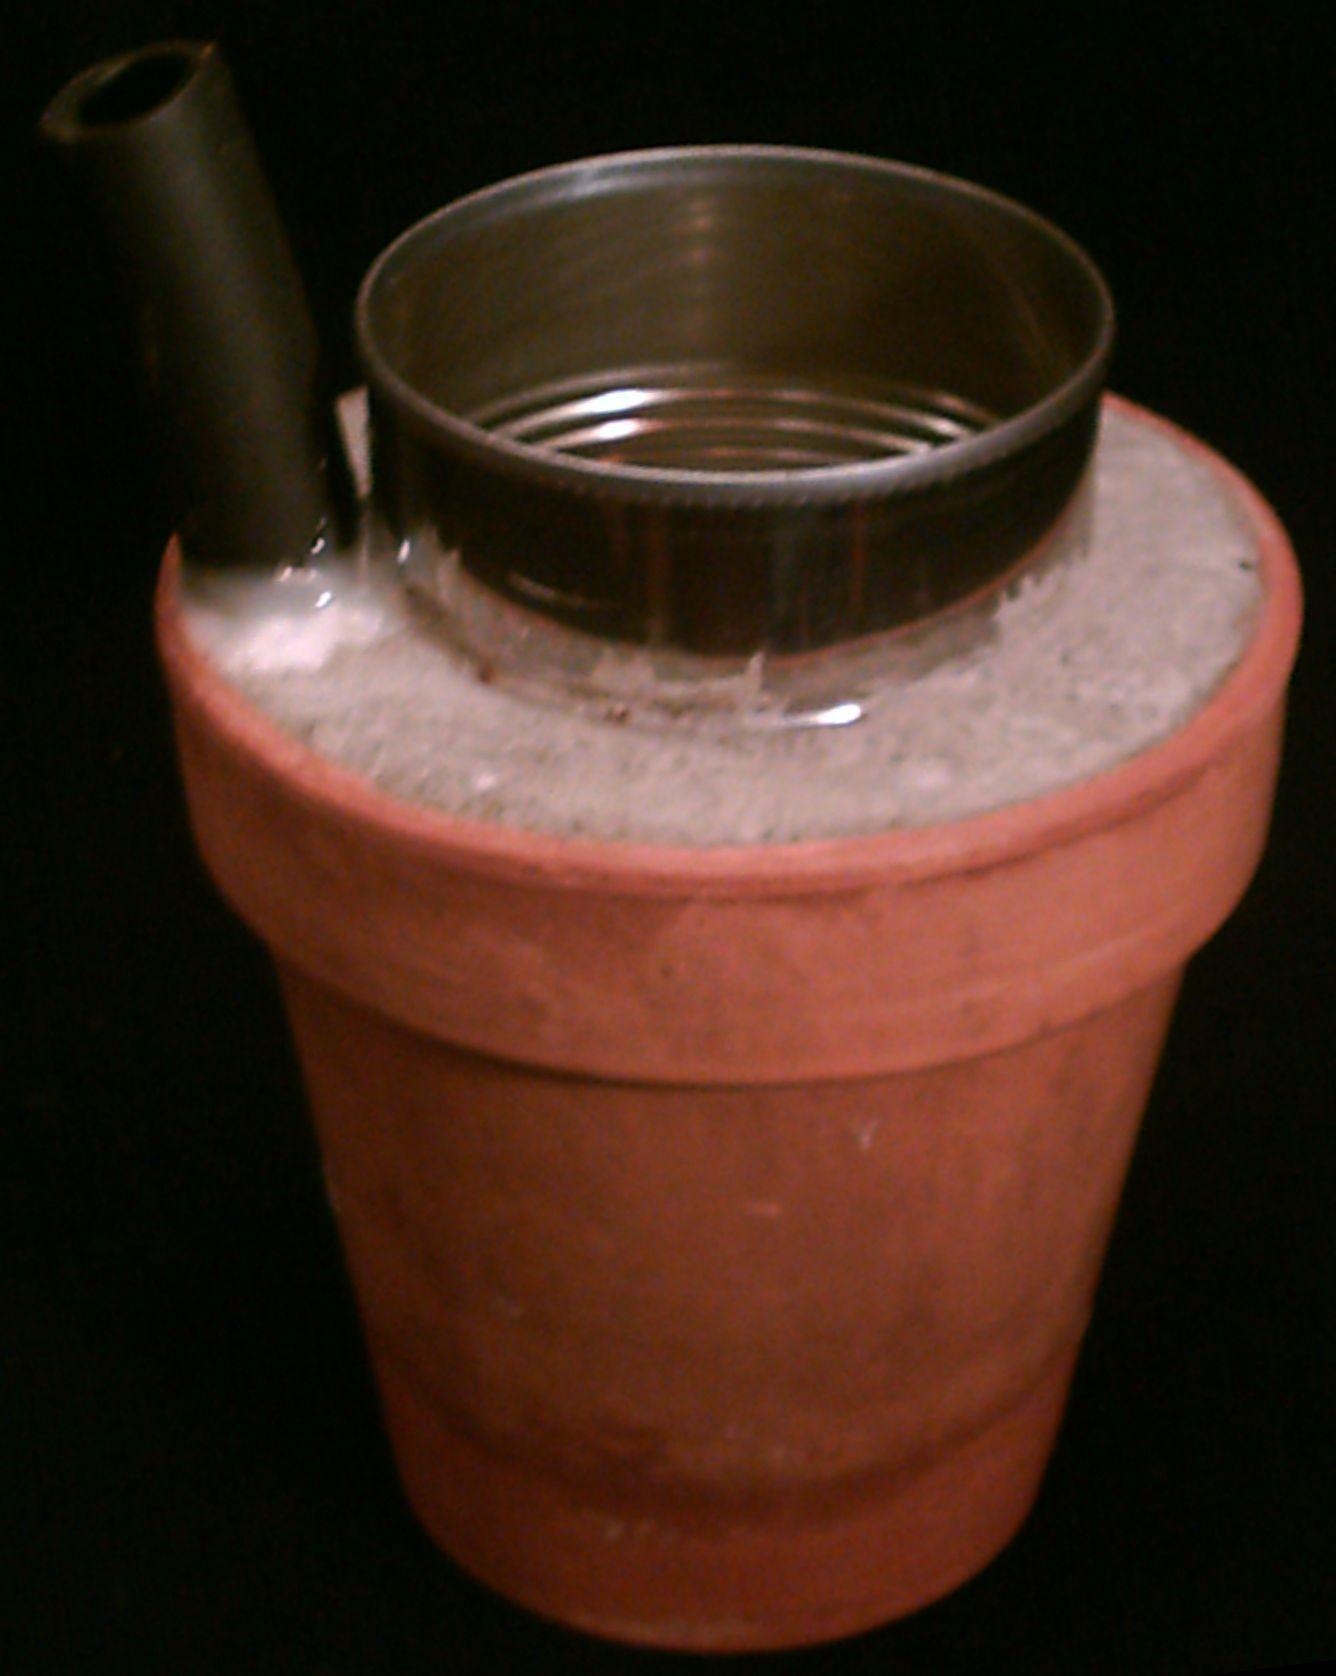 Make an Evaporative Terra Cotta Beer Chiller